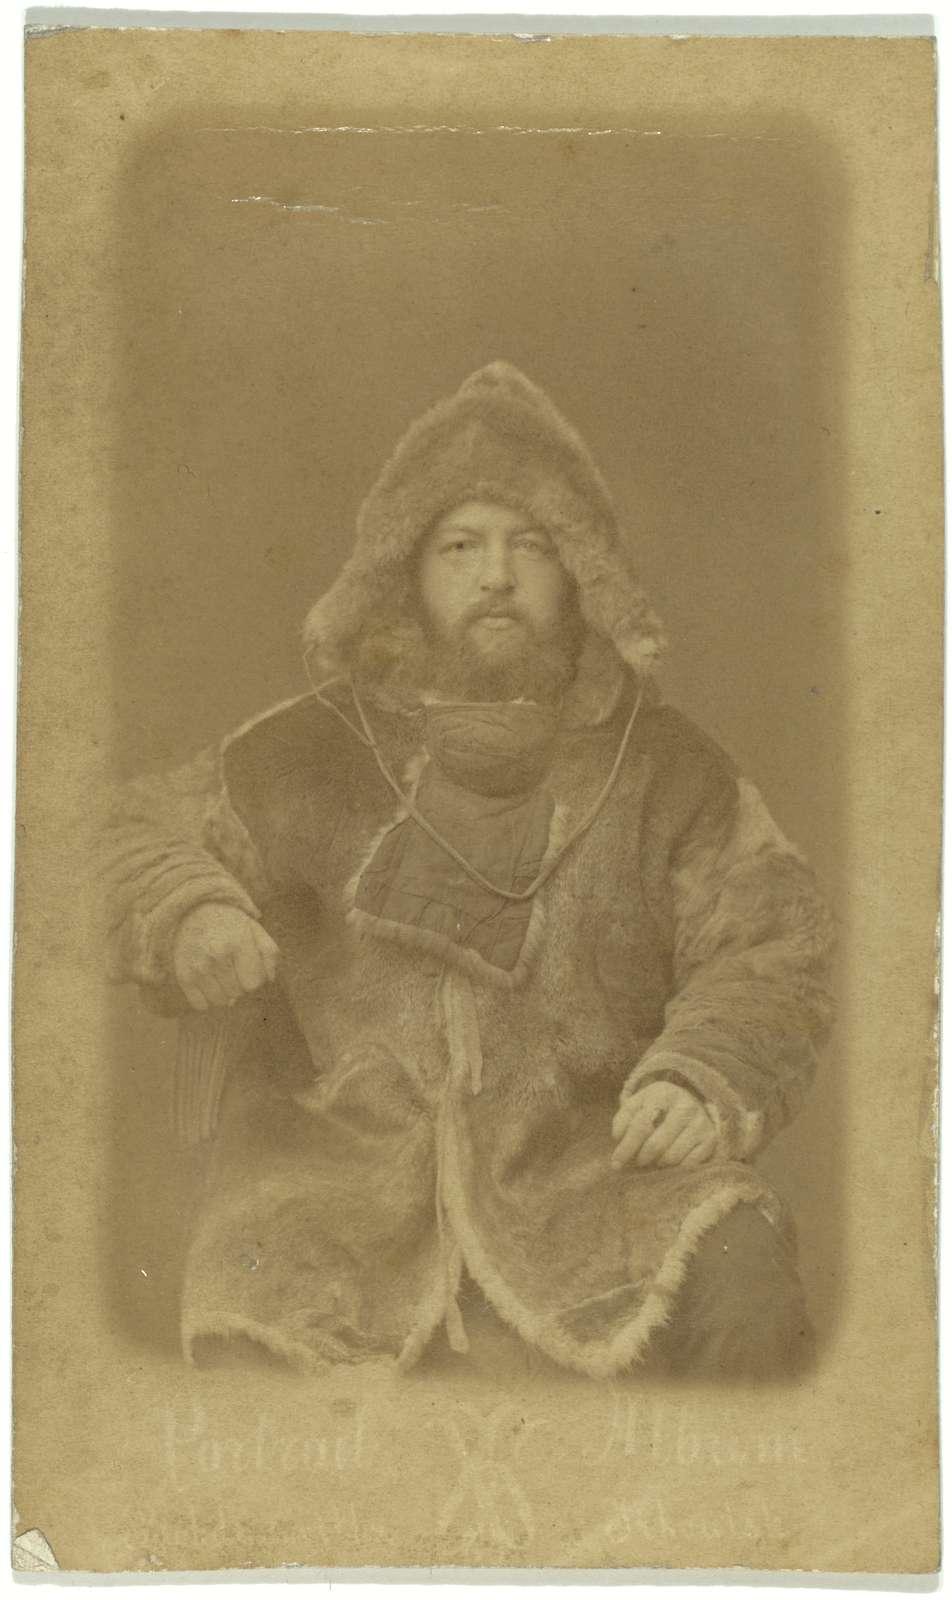 [Dr. Bunge, Siberian Arctic explorer, three-quarter length portrait, facing front]